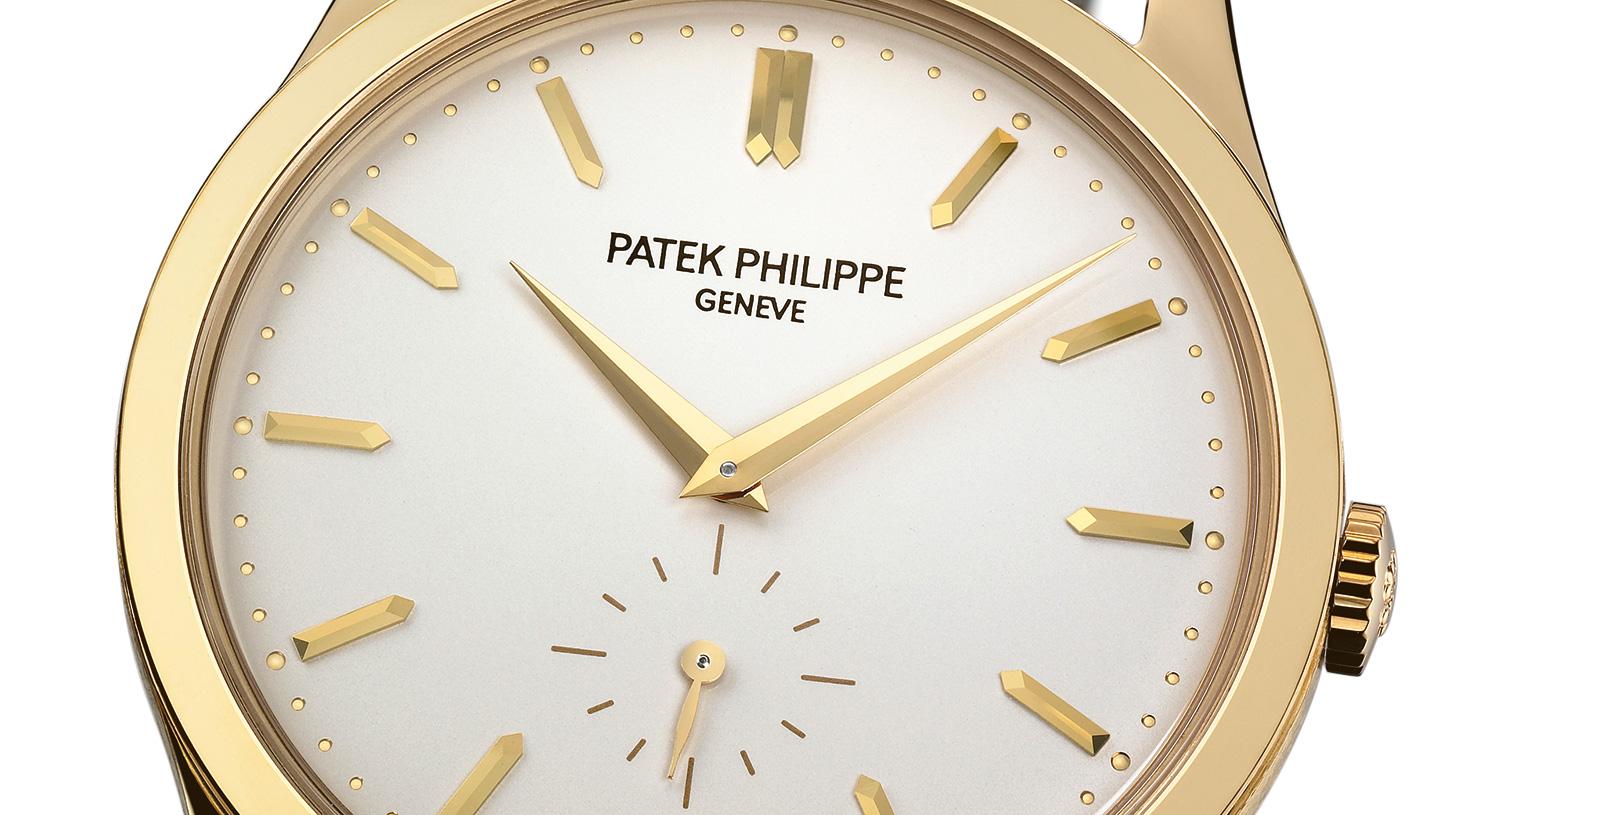 Patek Philippe Calatrava 5196R grad season